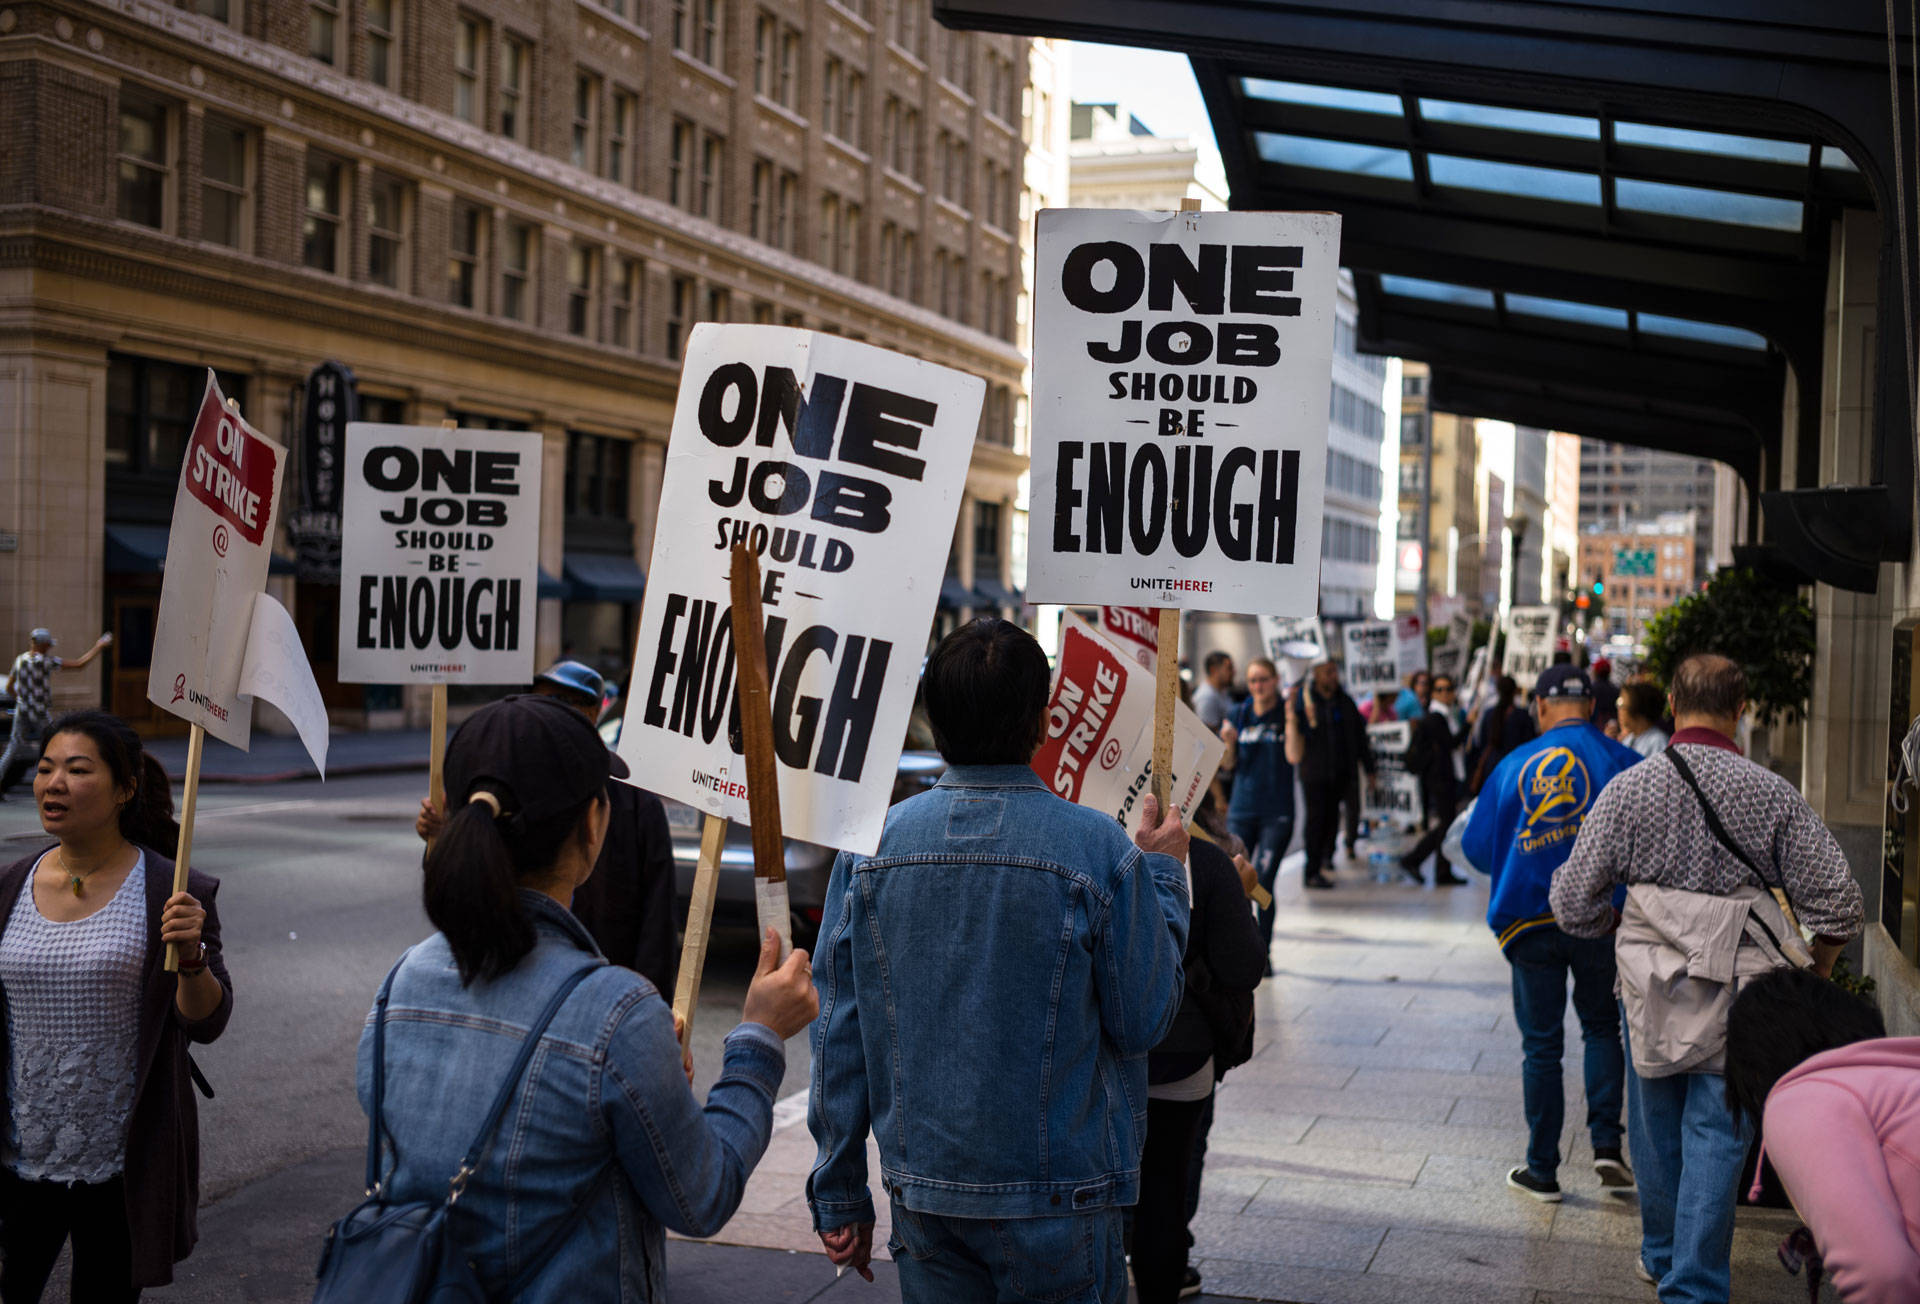 "Striking hotel workers picket outside San Francisco's Palace Hotel, part of Marriott Hotels, on Oct. 6, 2018. <a href=""https://www.flickr.com/photos/gedankenstuecke/"">Bastian Greshake Tzovaras</a>/Flickr"